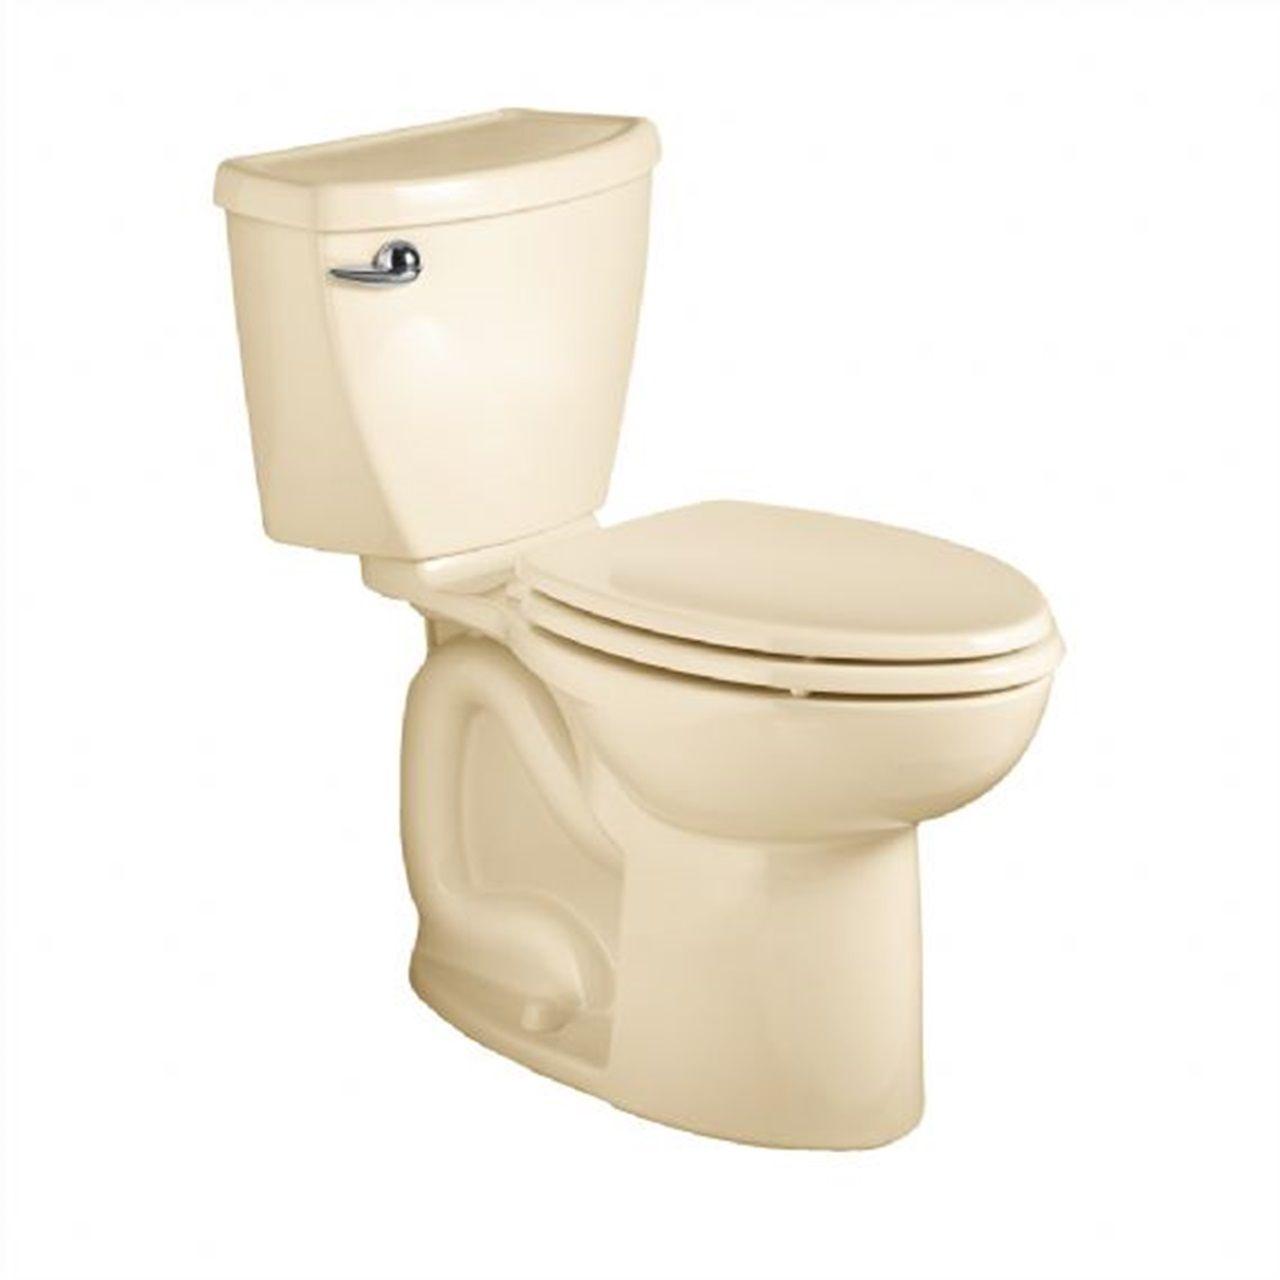 Cadet 3 Toilet American Standard Water Sense Elongated Toilet Seat